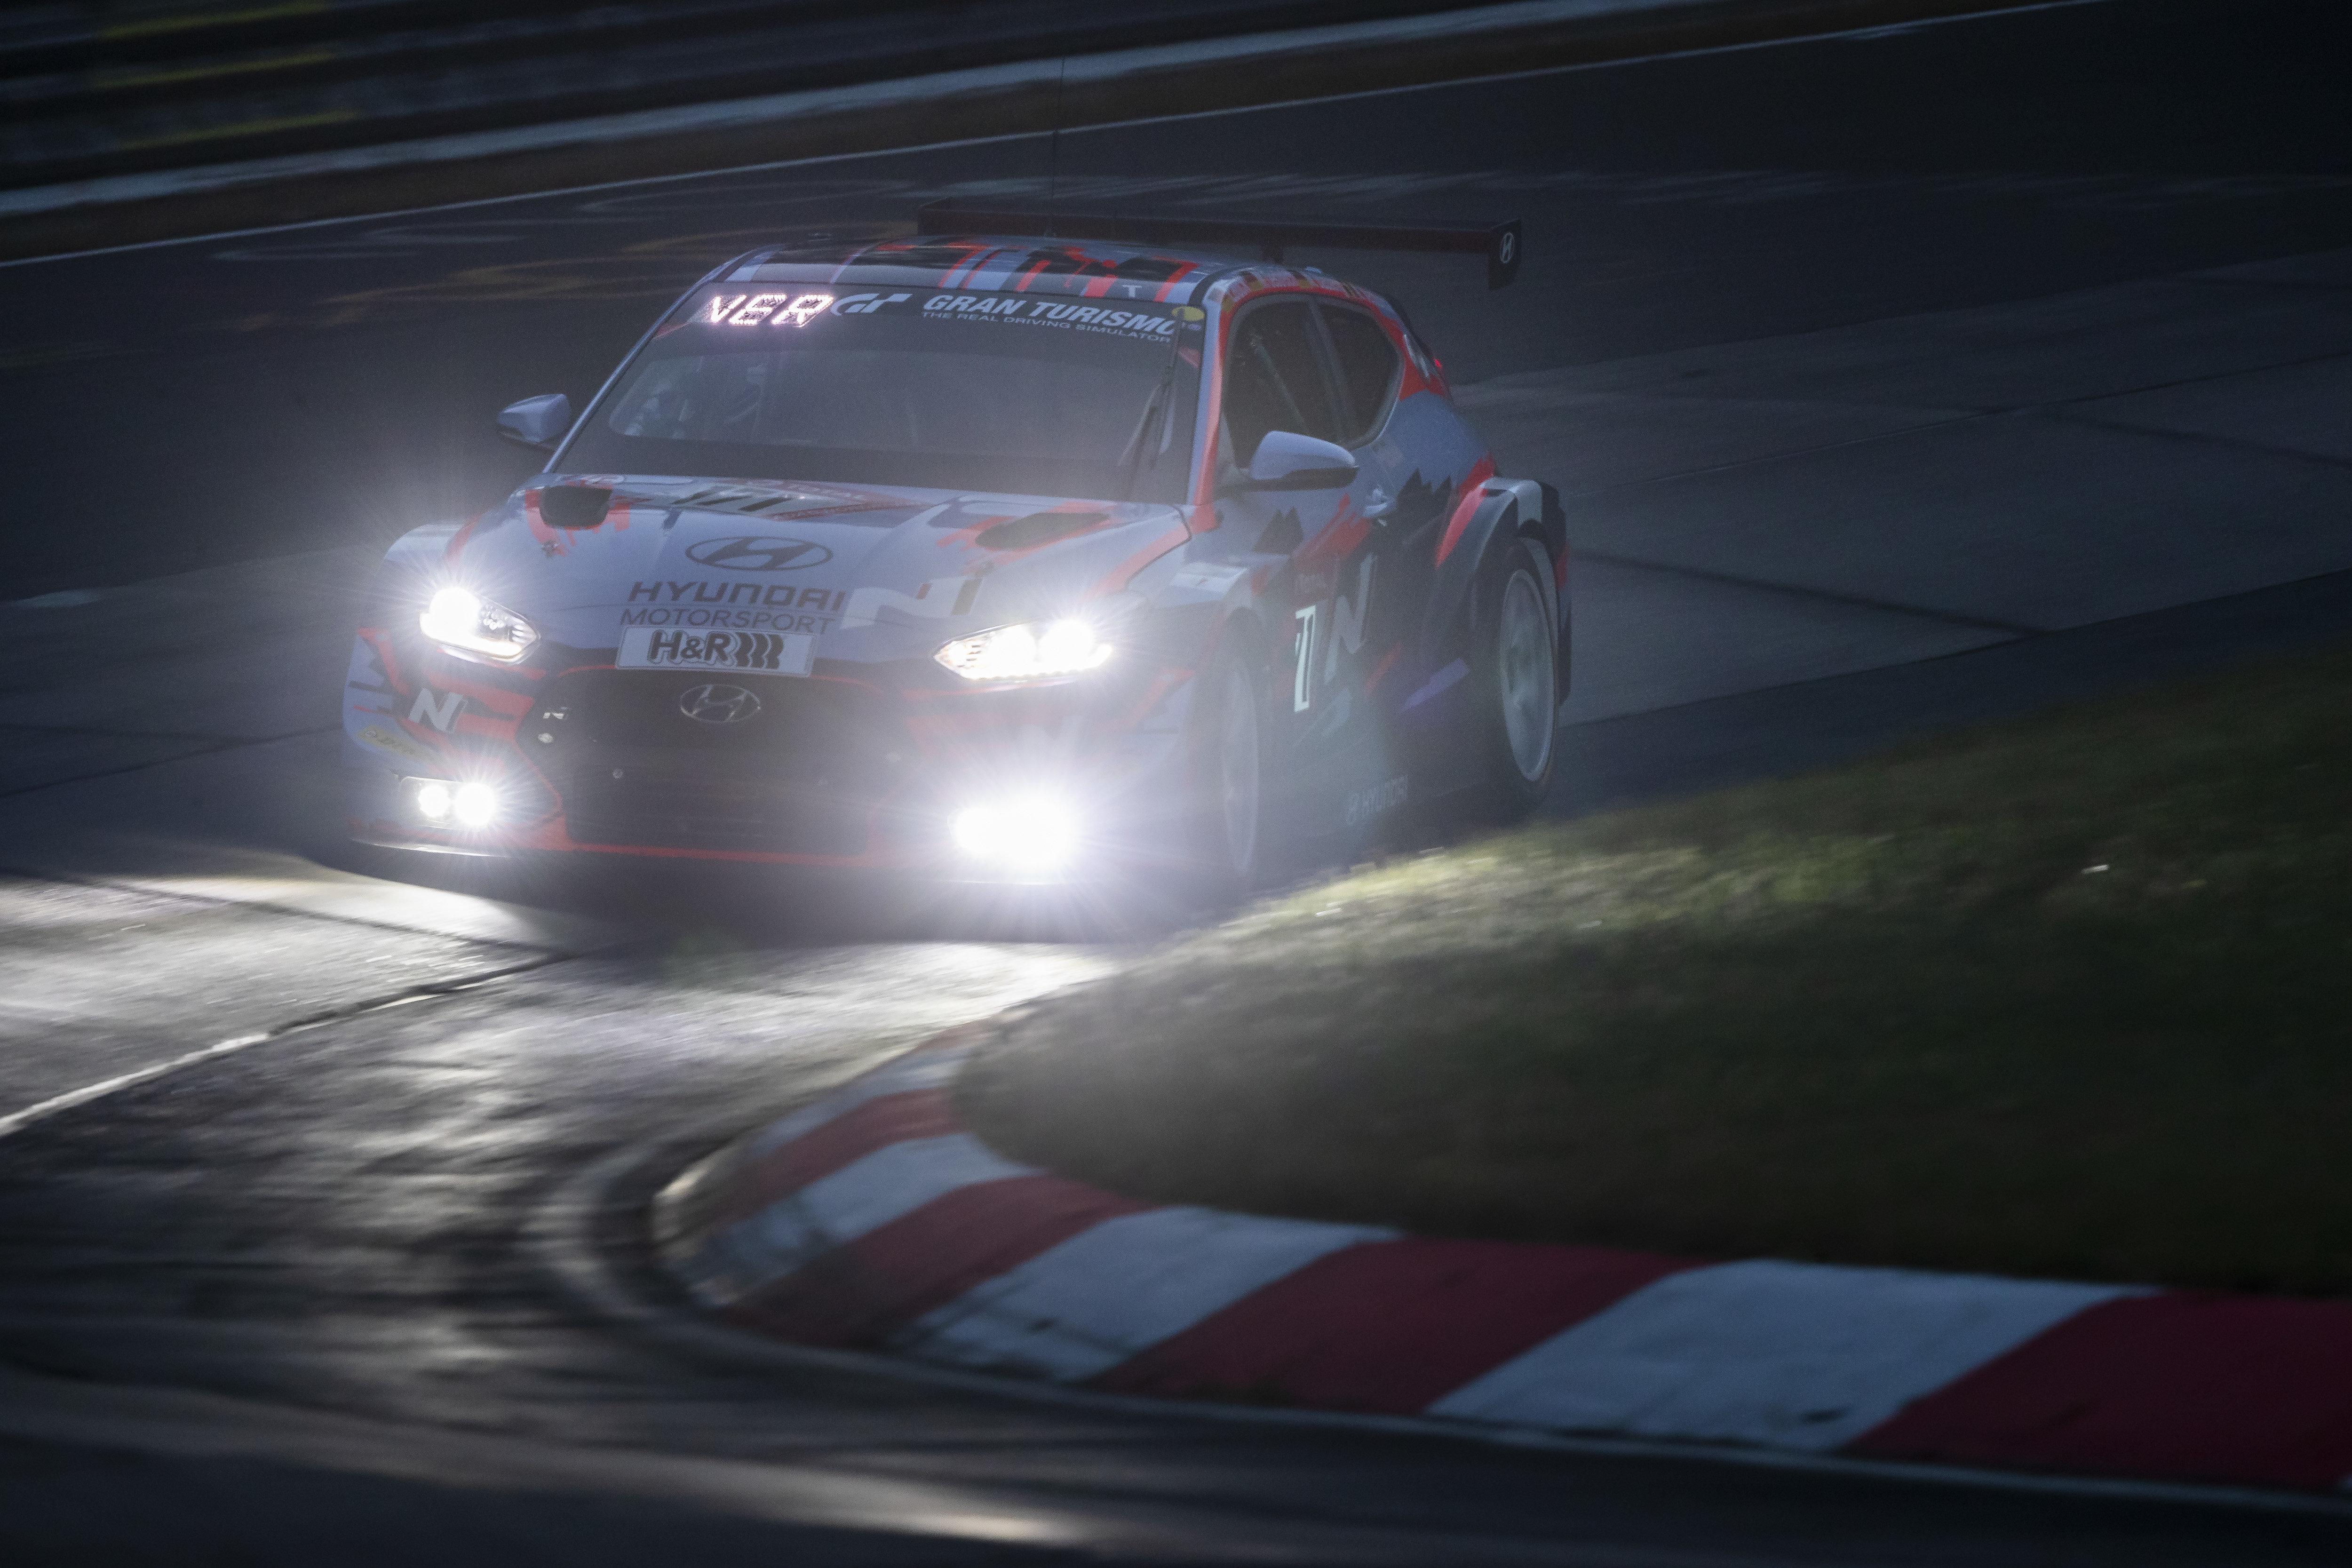 Hyundai Veloster N TCR - Nürburgring 24 Hours